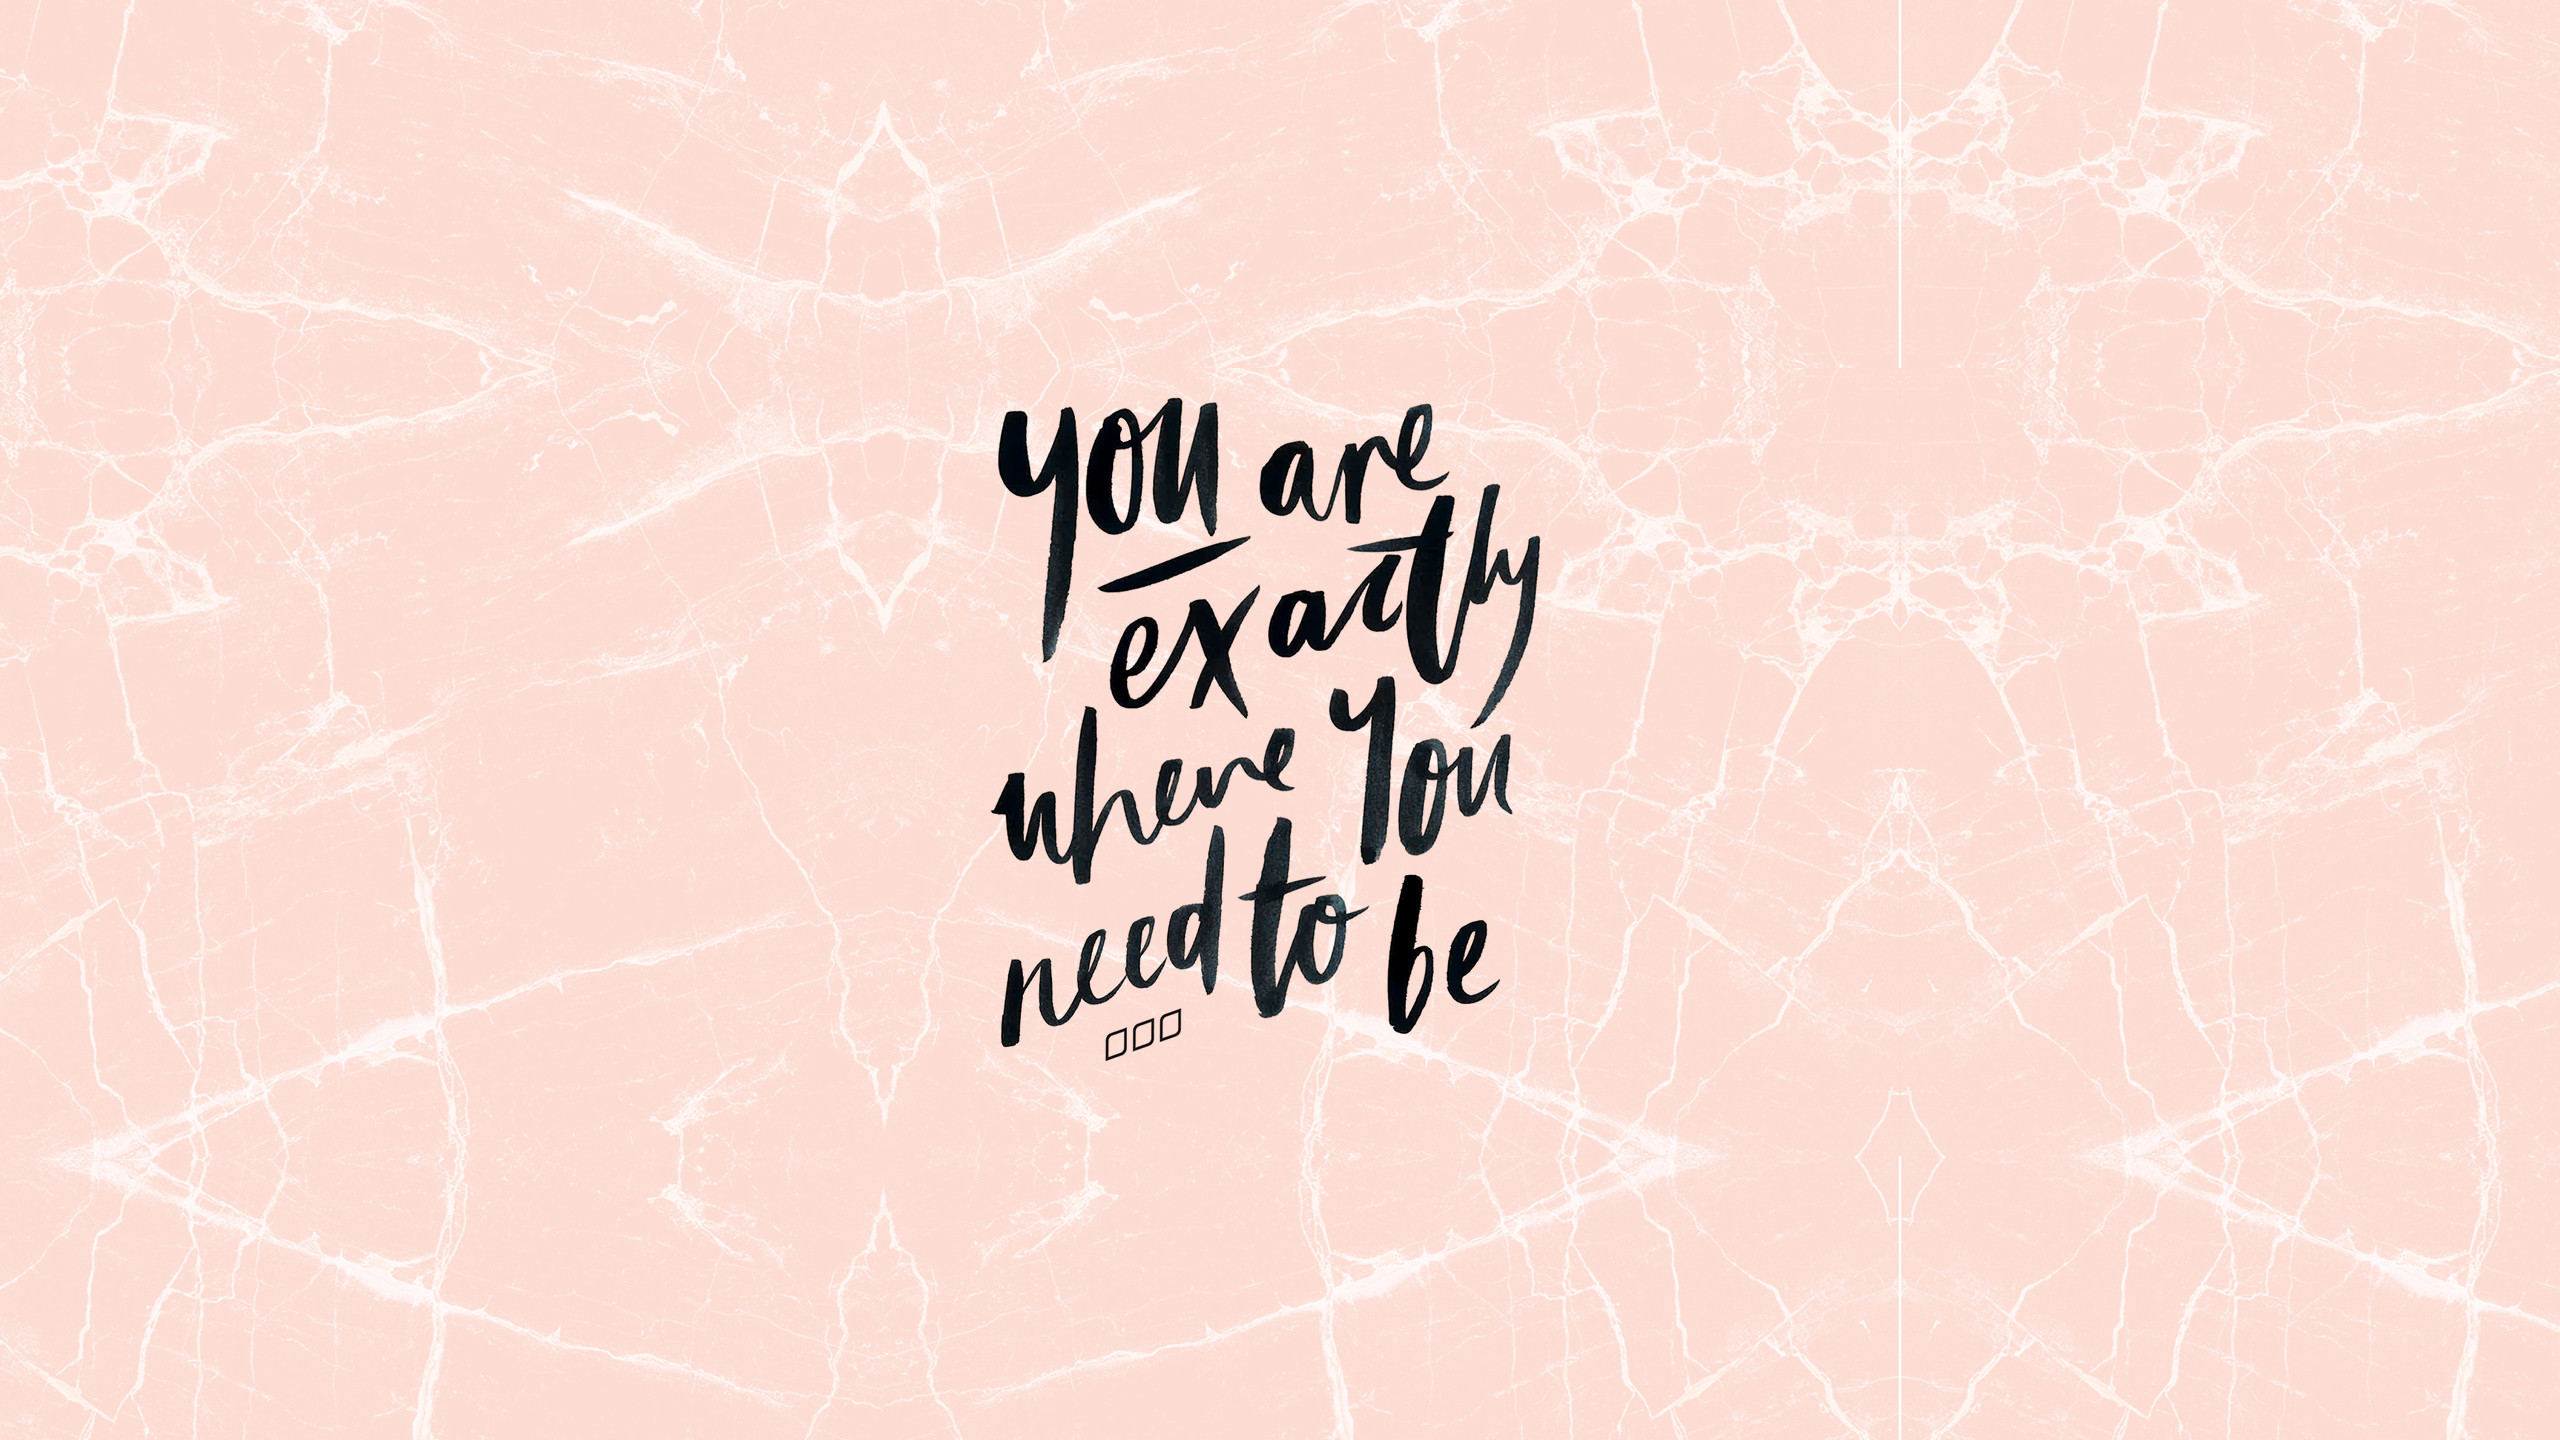 Motivation- desktop wallpaper from the female entrepreneur association |  Positive Inspirational Quotes | Pinterest | Motivation, Wallpaper and  Inspirational